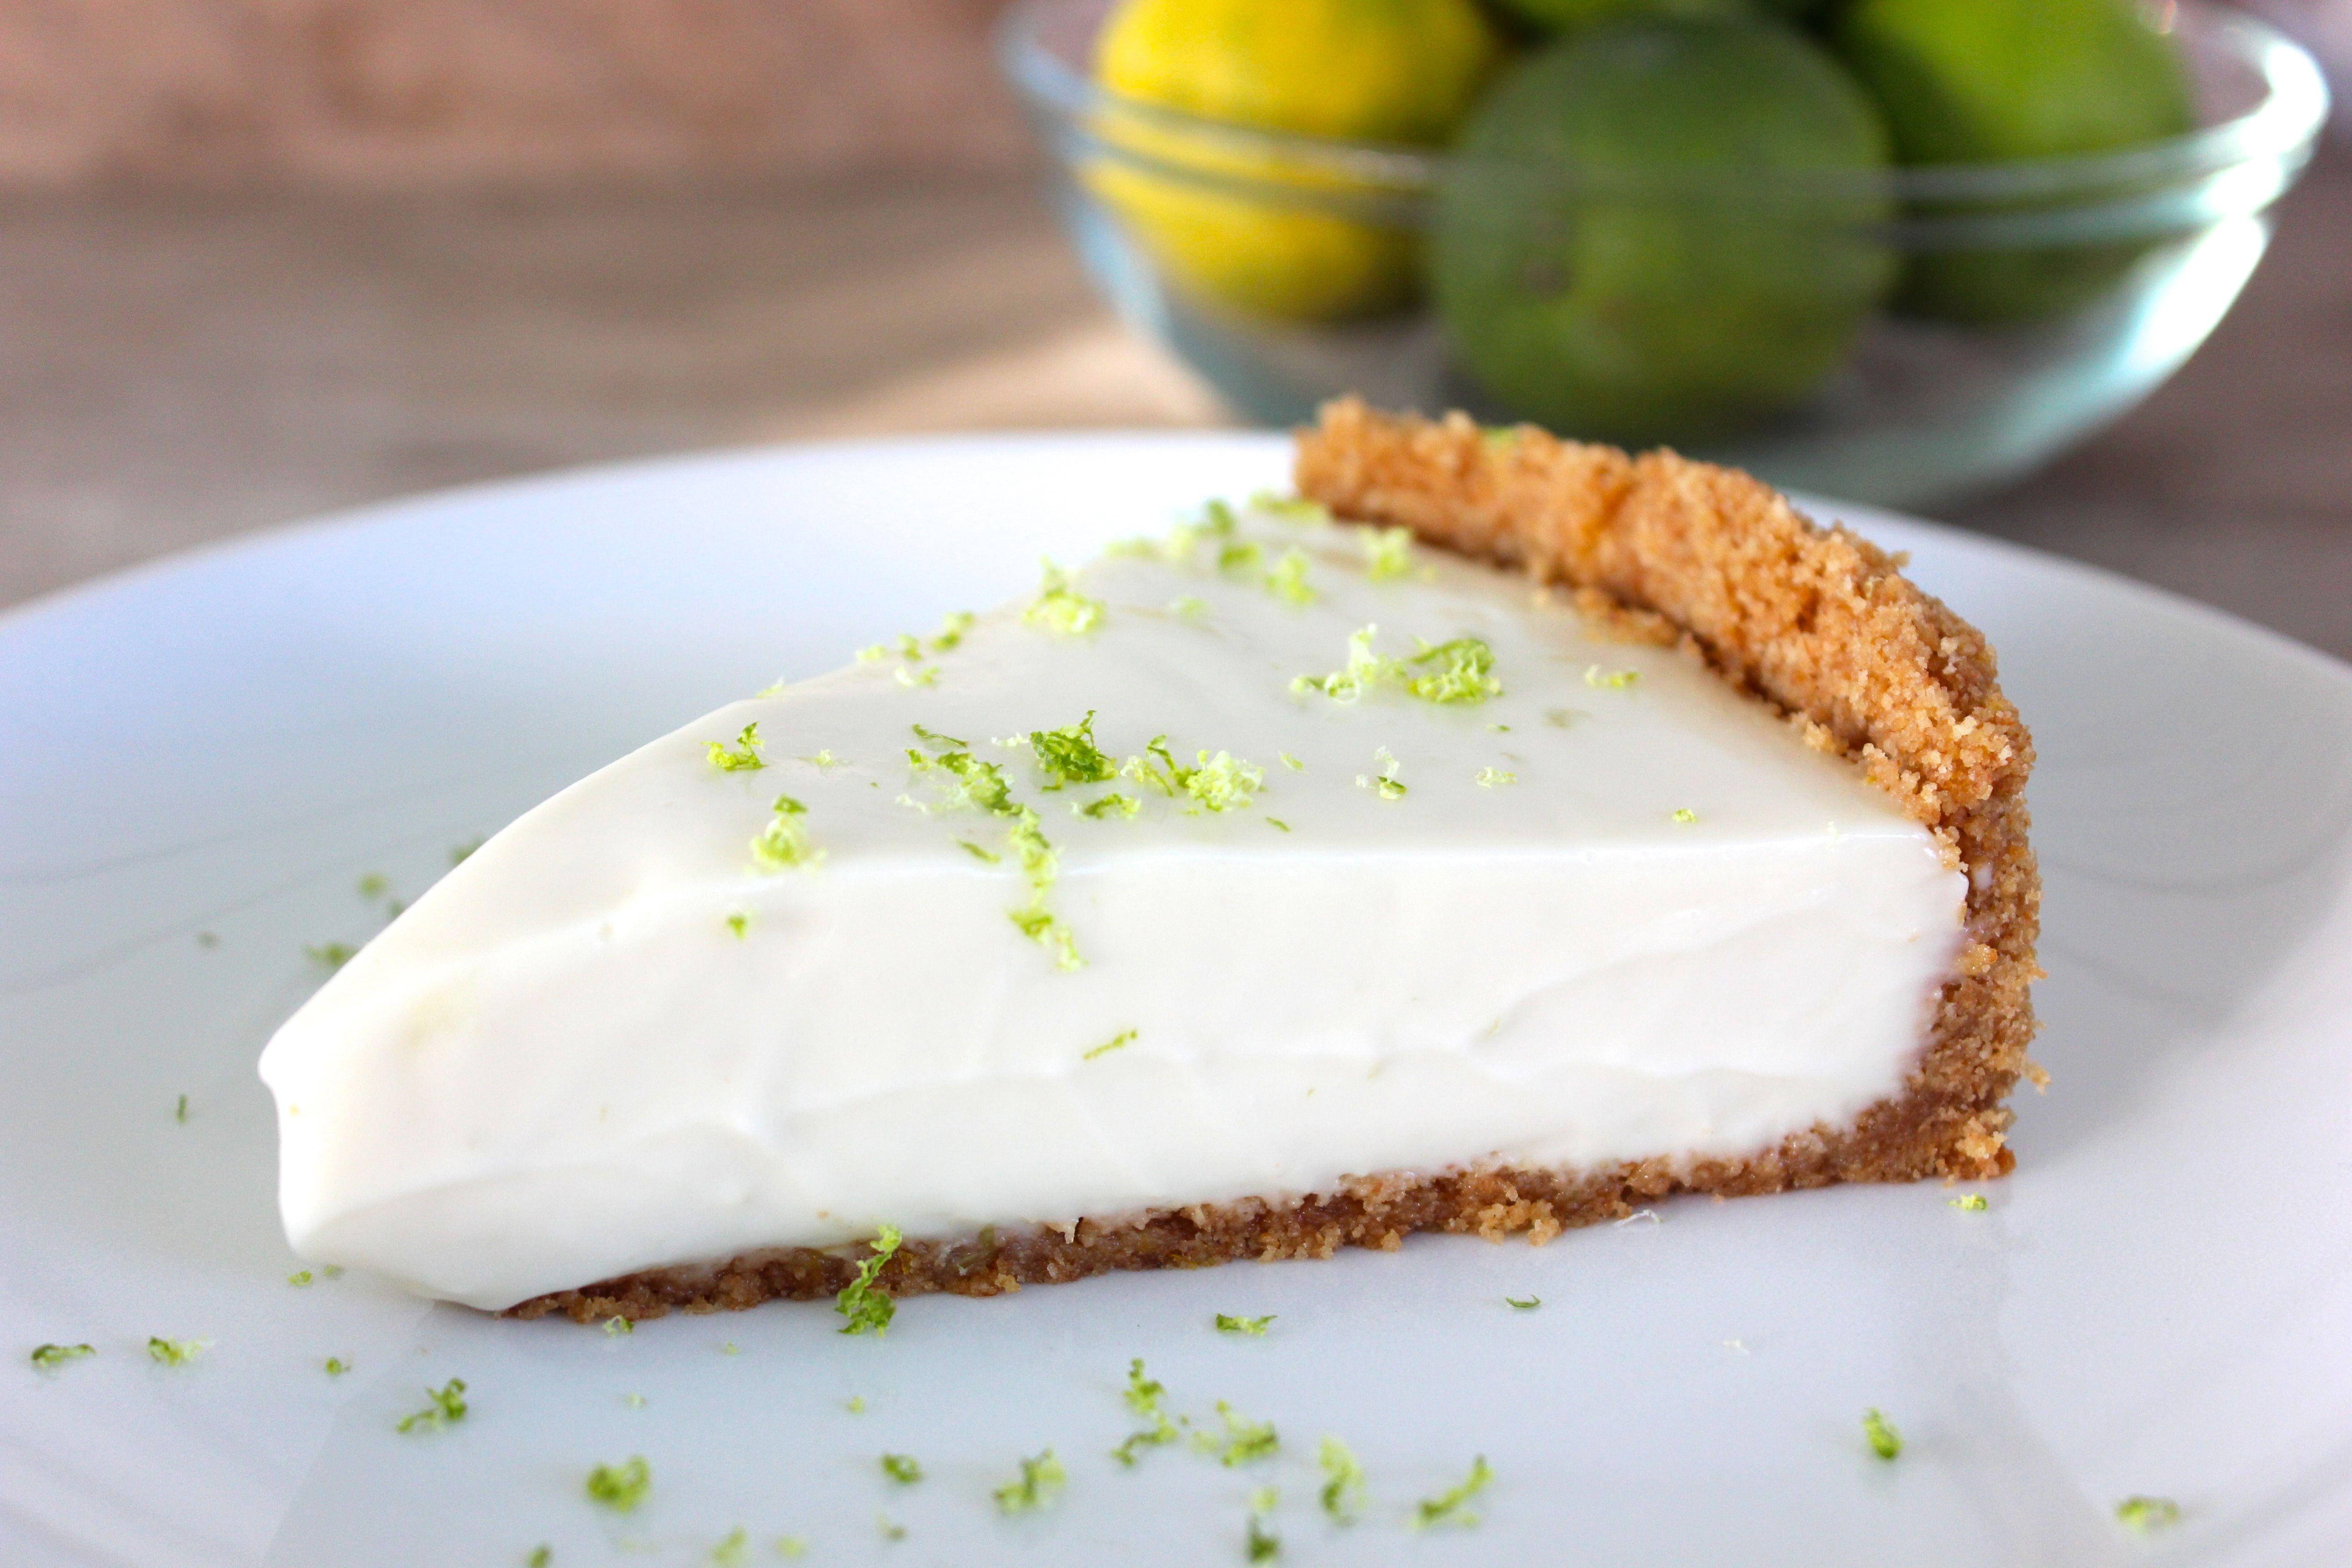 Lime Dessert Recipes  Paleo Dessert No Bake Key Lime Pie